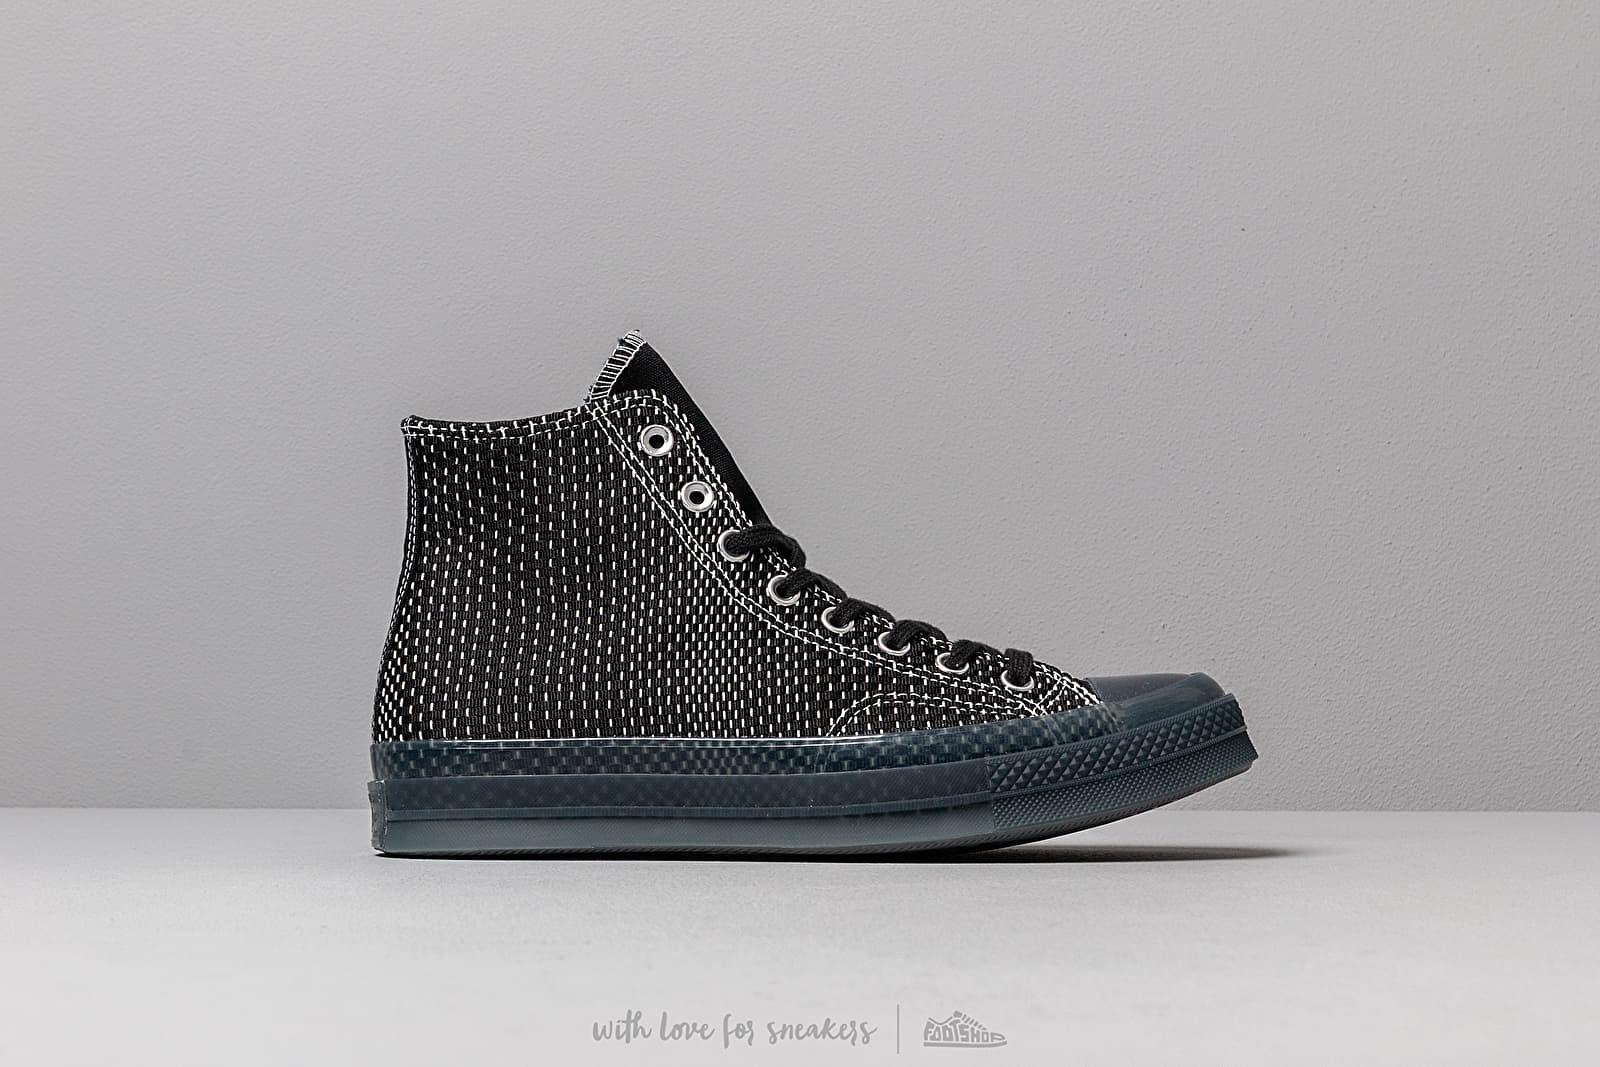 Converse Chuck Taylor All Star 70 Black White Cool Grey | Footshop